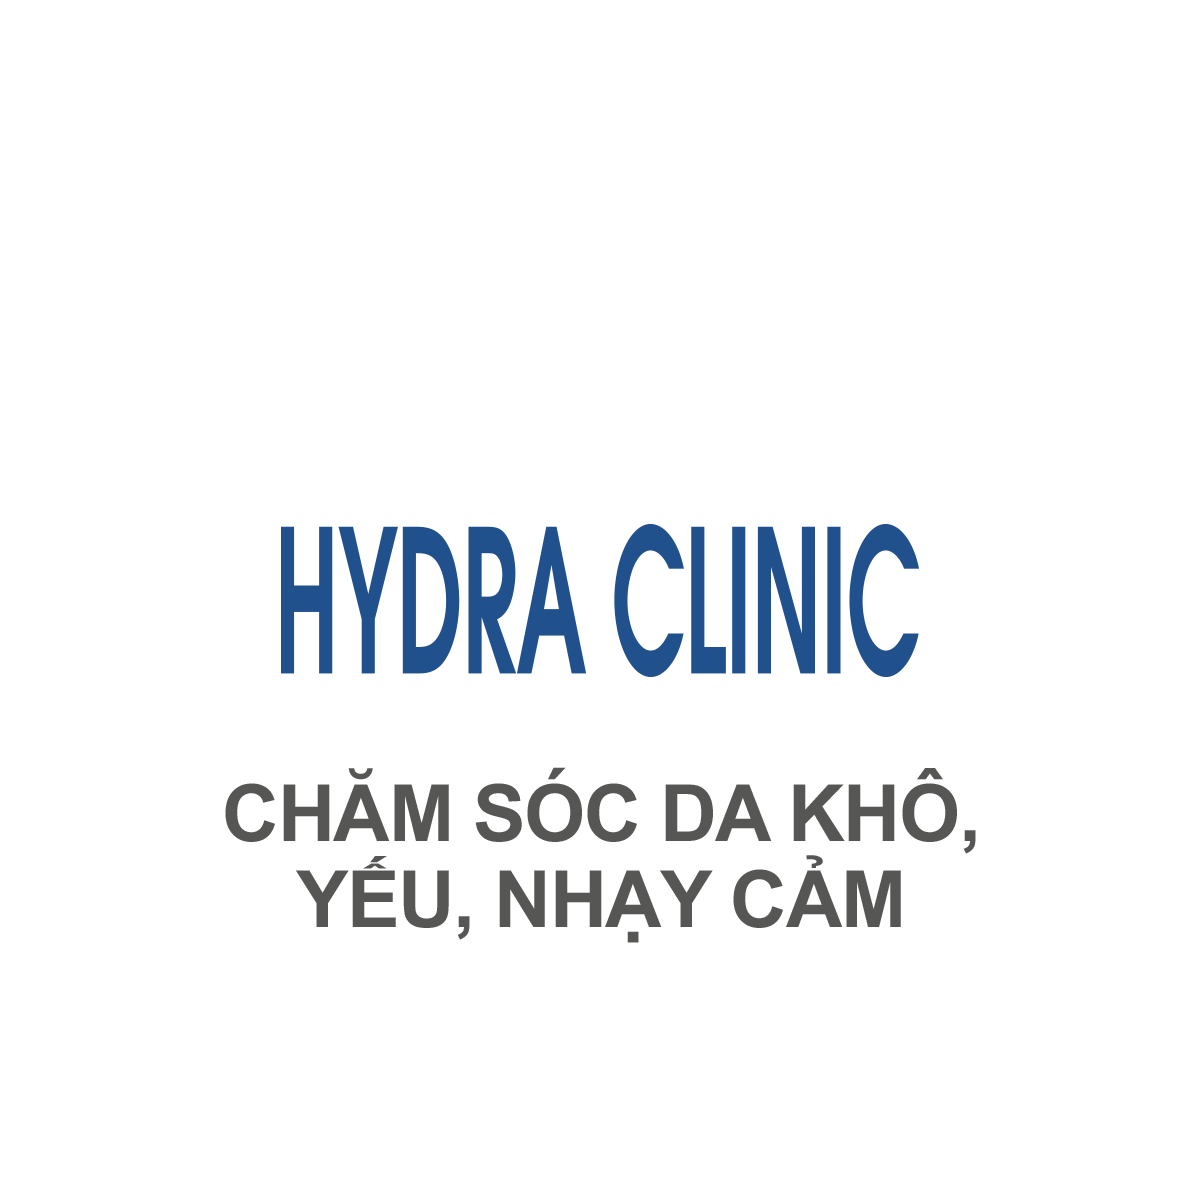 HYDRA CLINIC